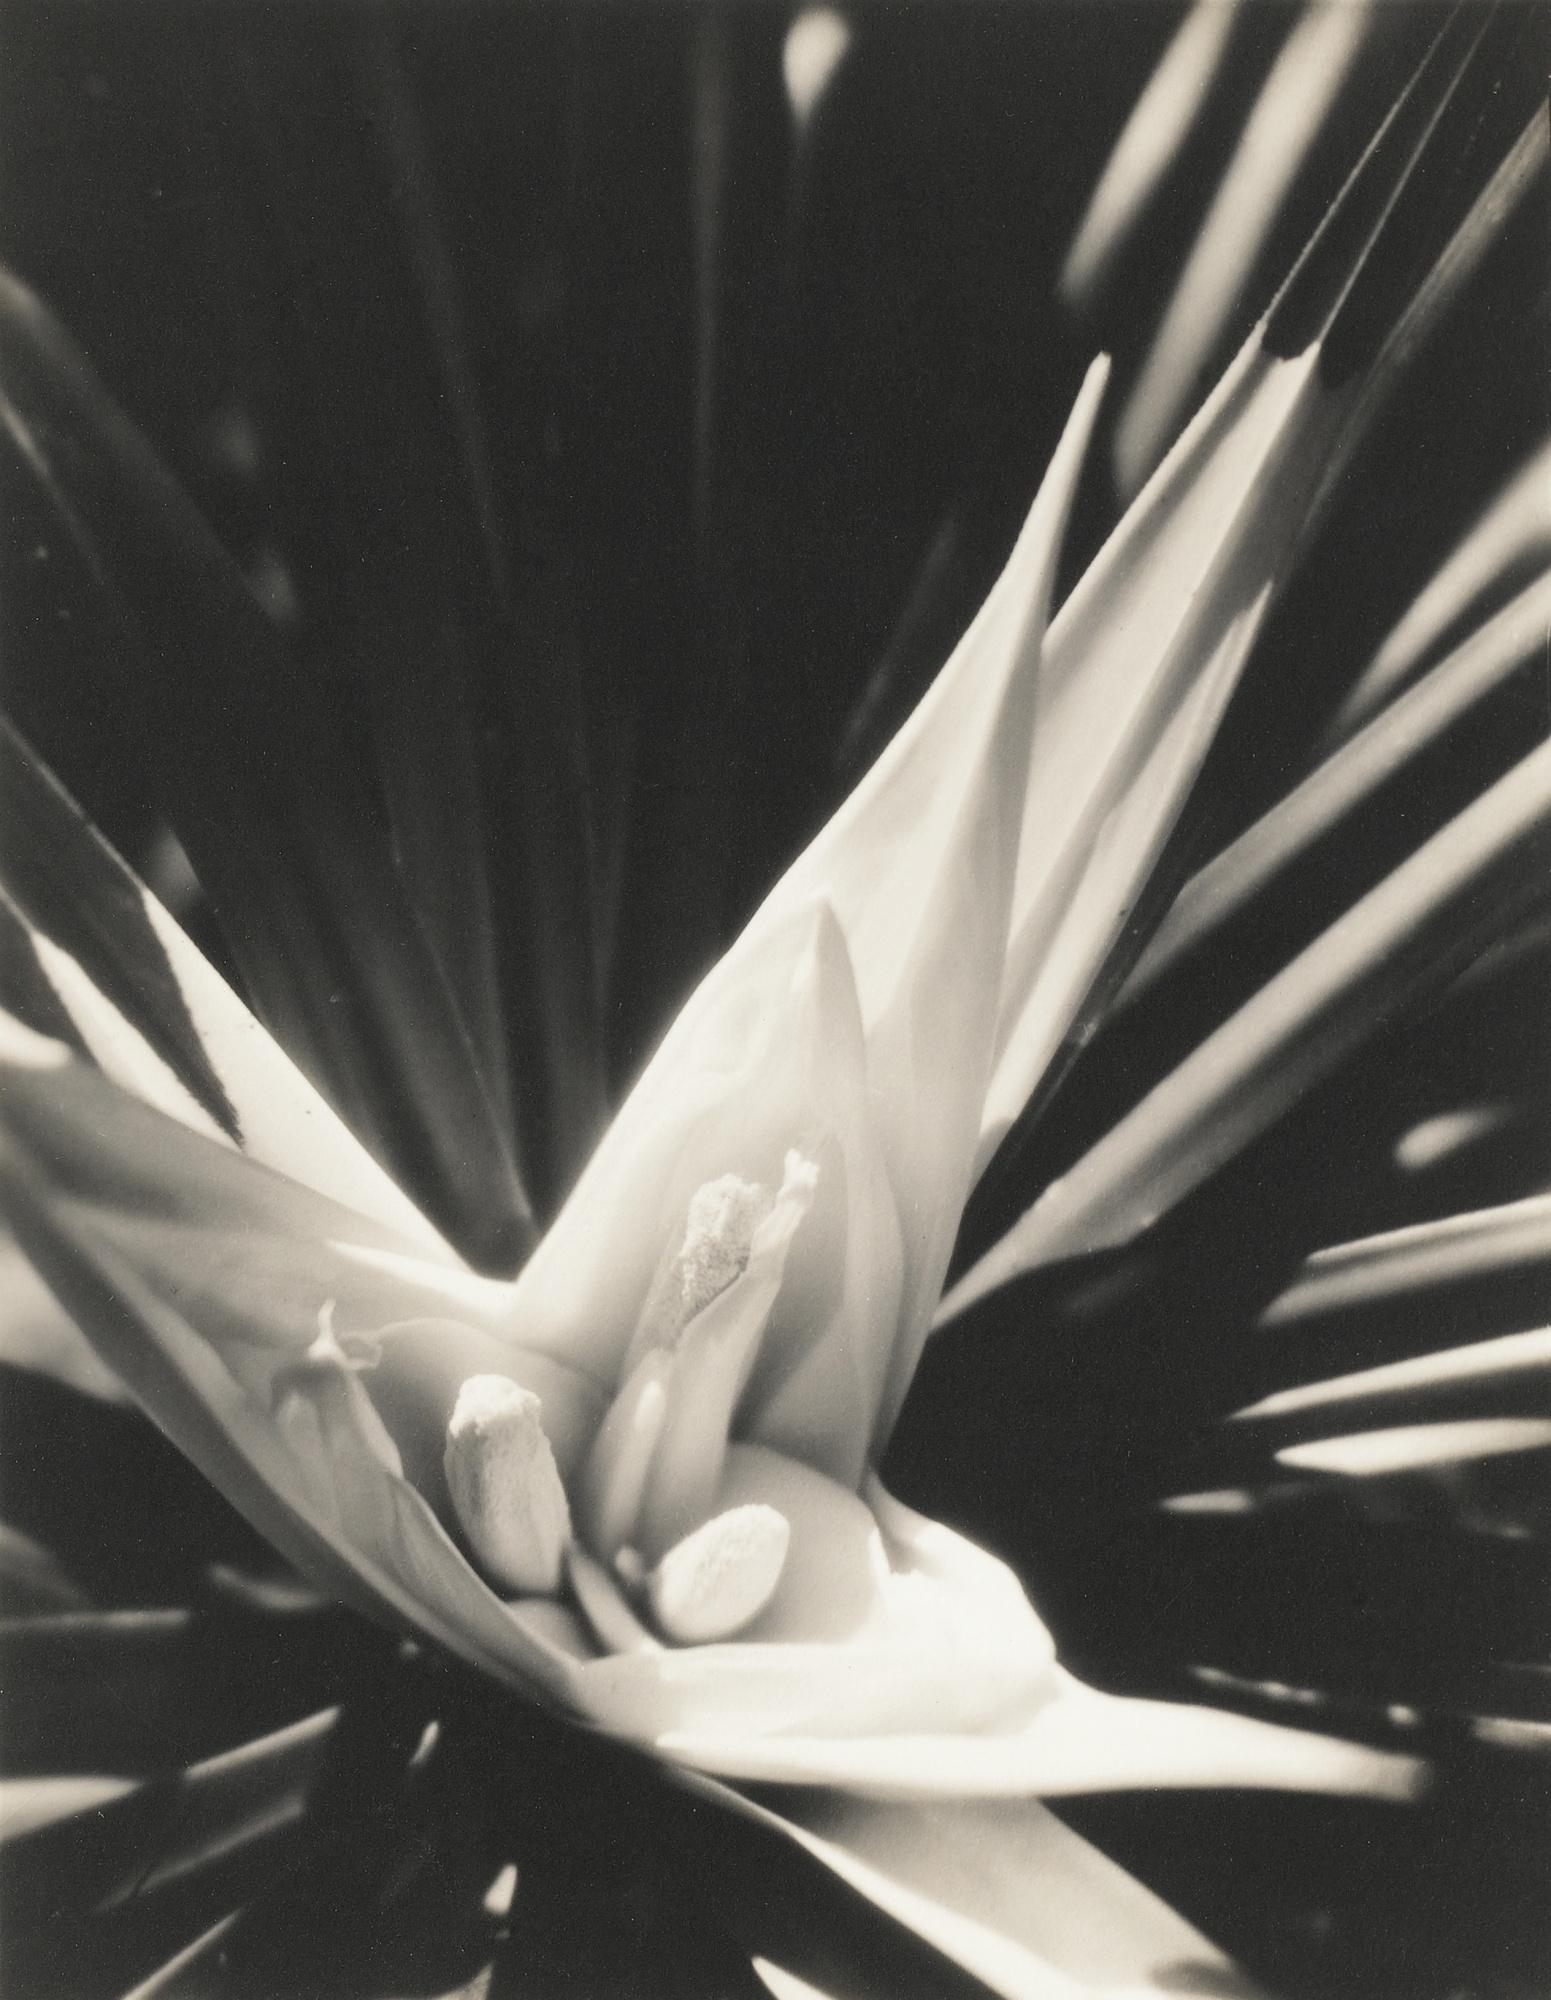 Karl Struss-Plant Study San Francisco Vers-1930